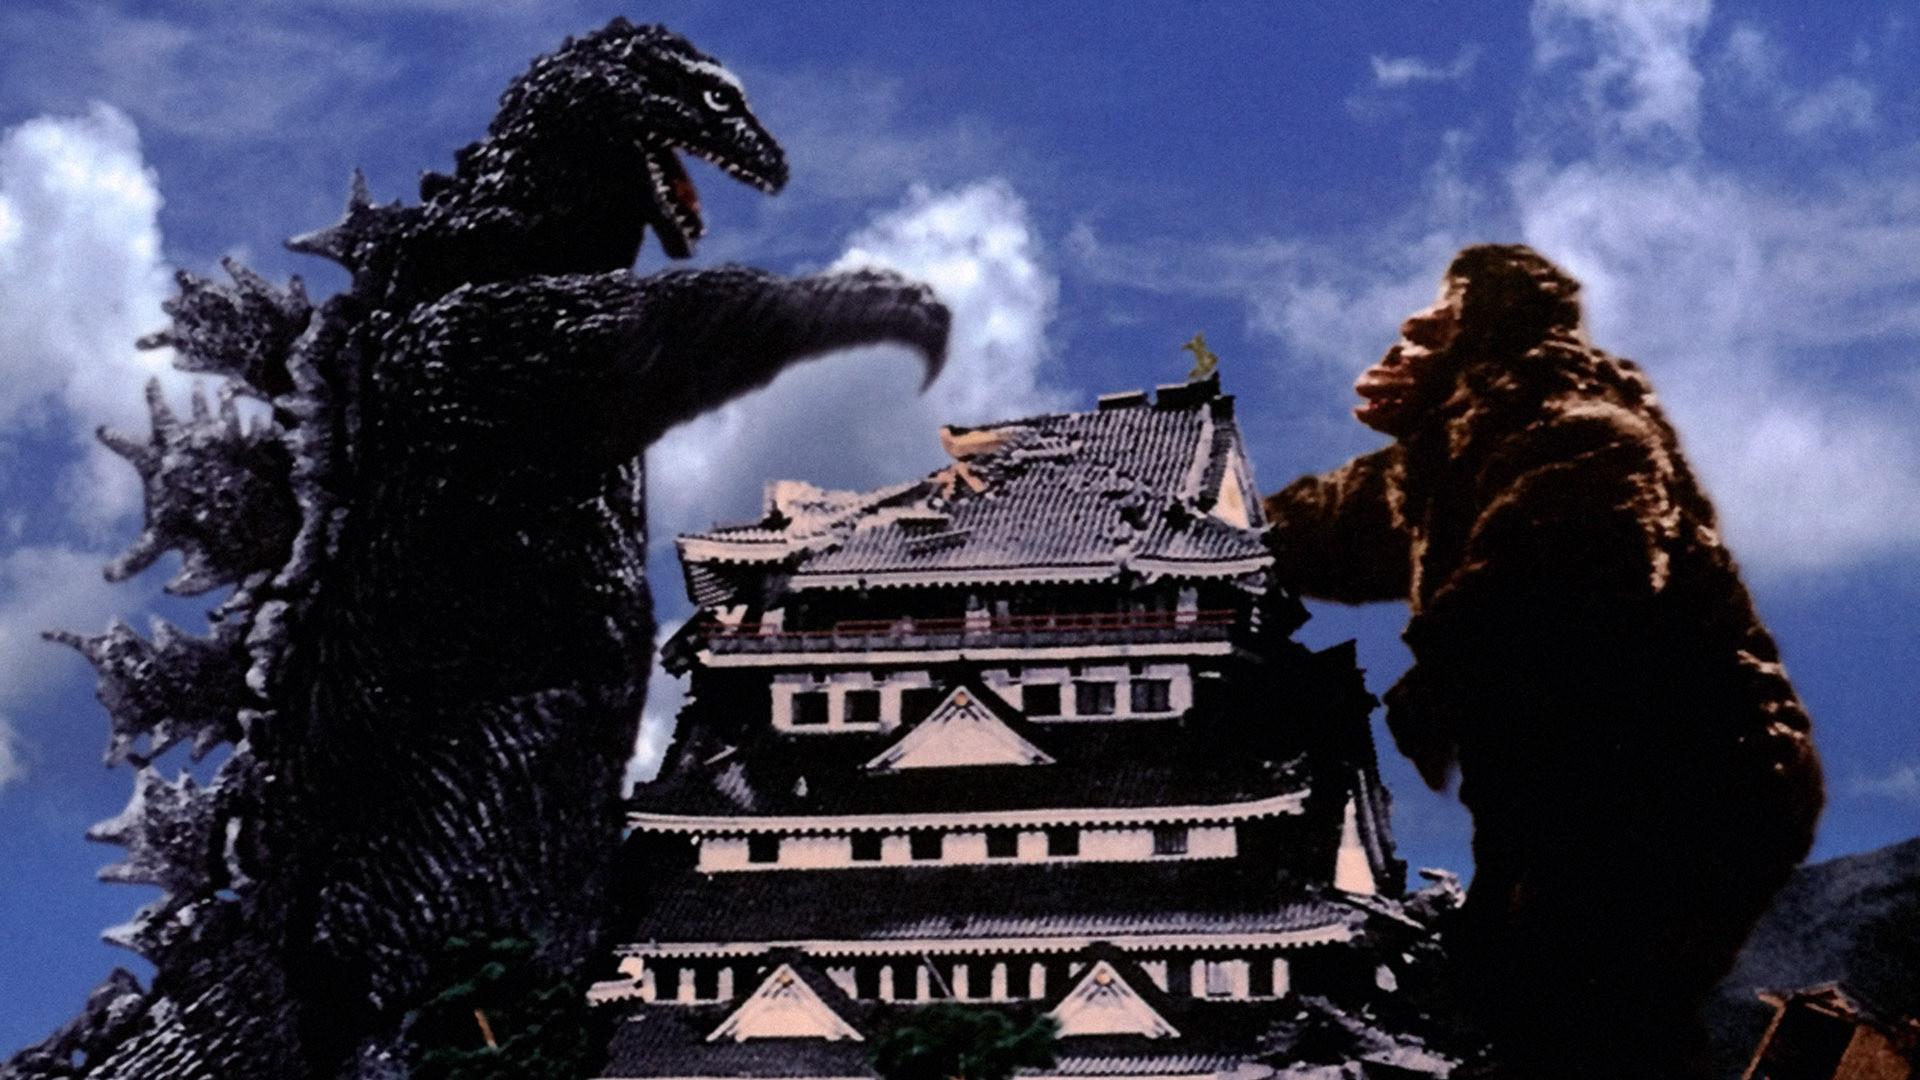 Get Ready To Rumble – King Kong Vs. Godzilla Is Coming 2020